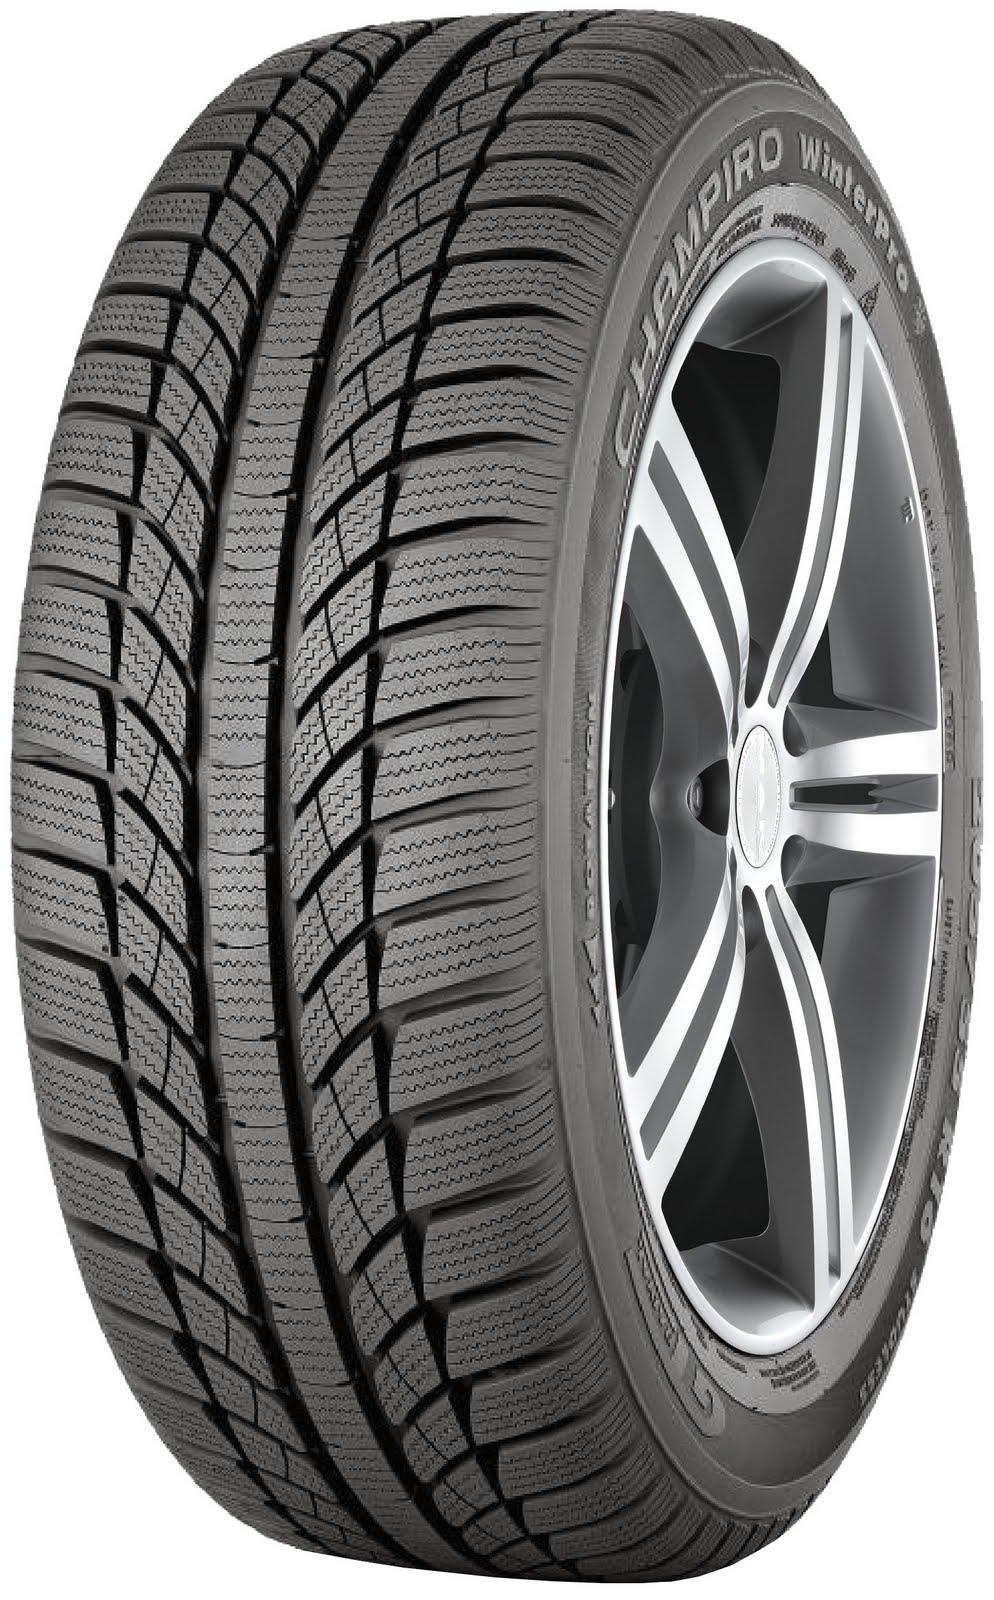 GT Radial Champiro Winter Pro 235/60 R18 107H XL